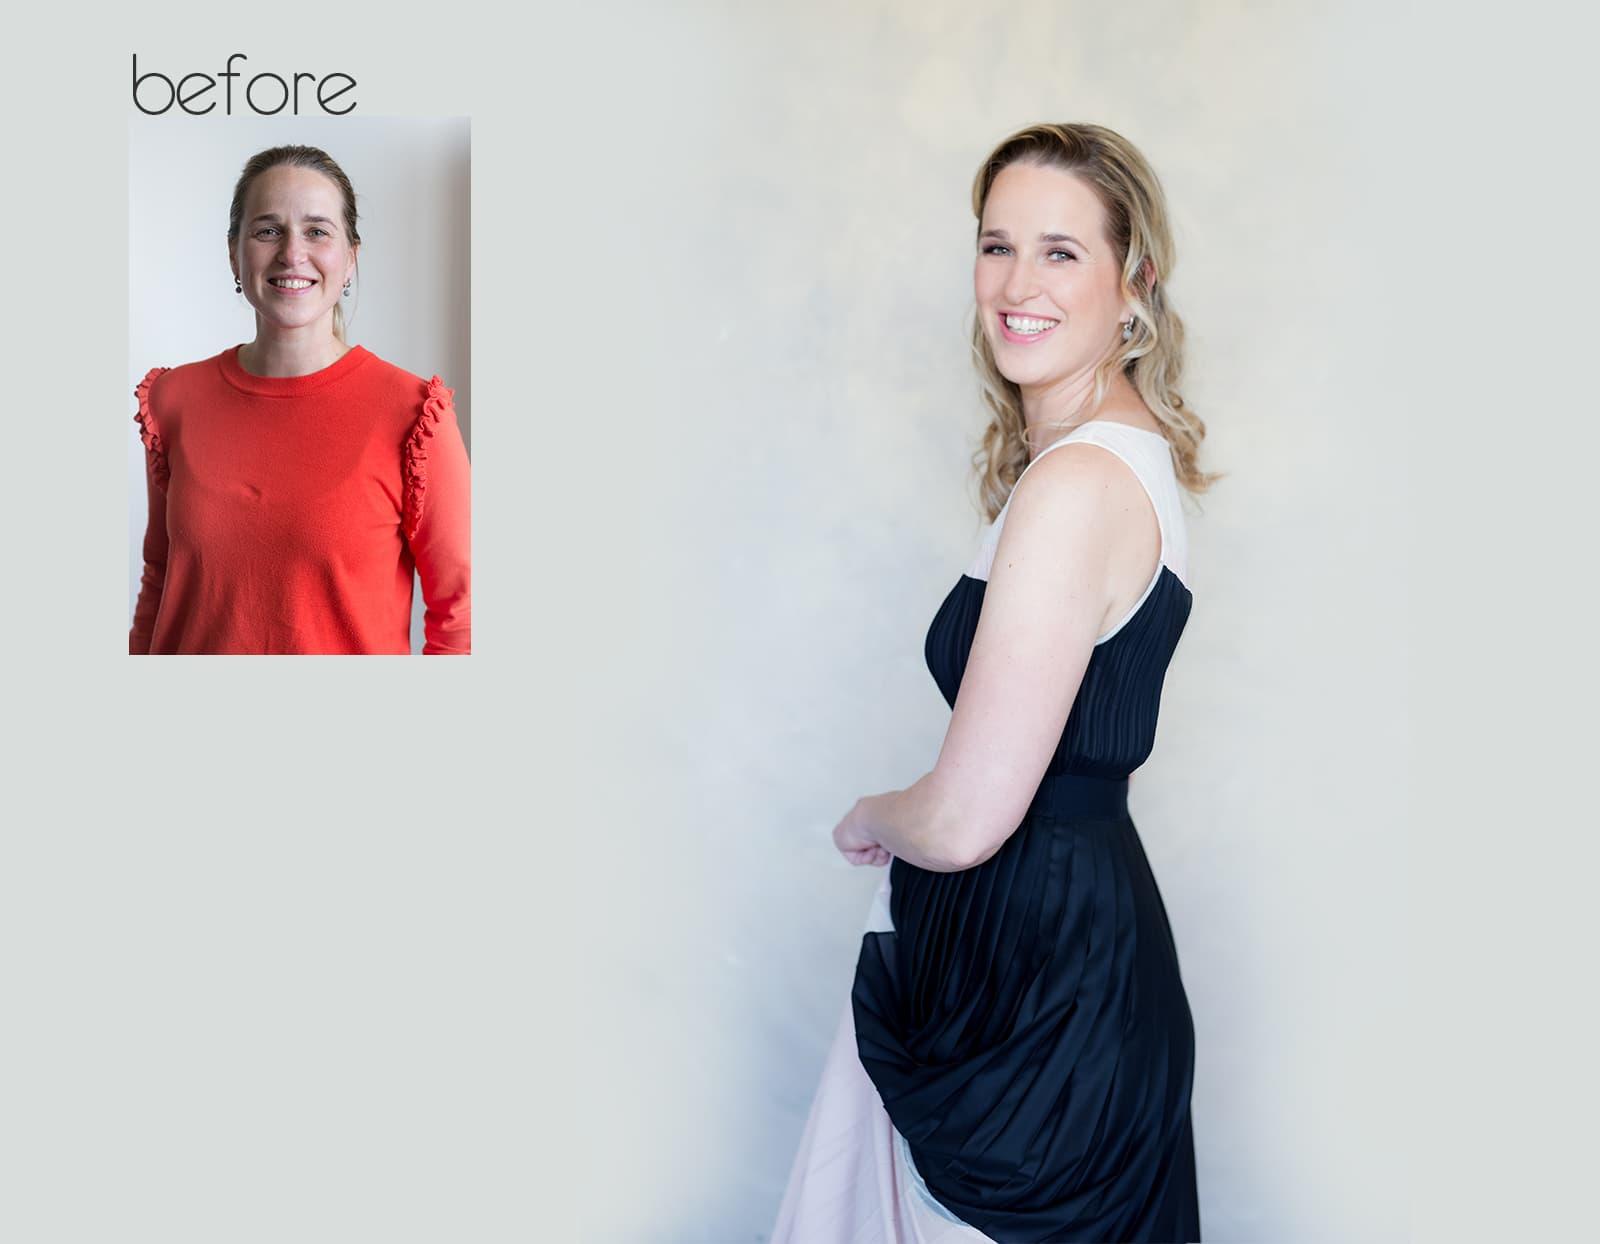 before after fotoshoot Mariska Rotterdam beauty headshot corporate branding fotostudio Katinka Tromp